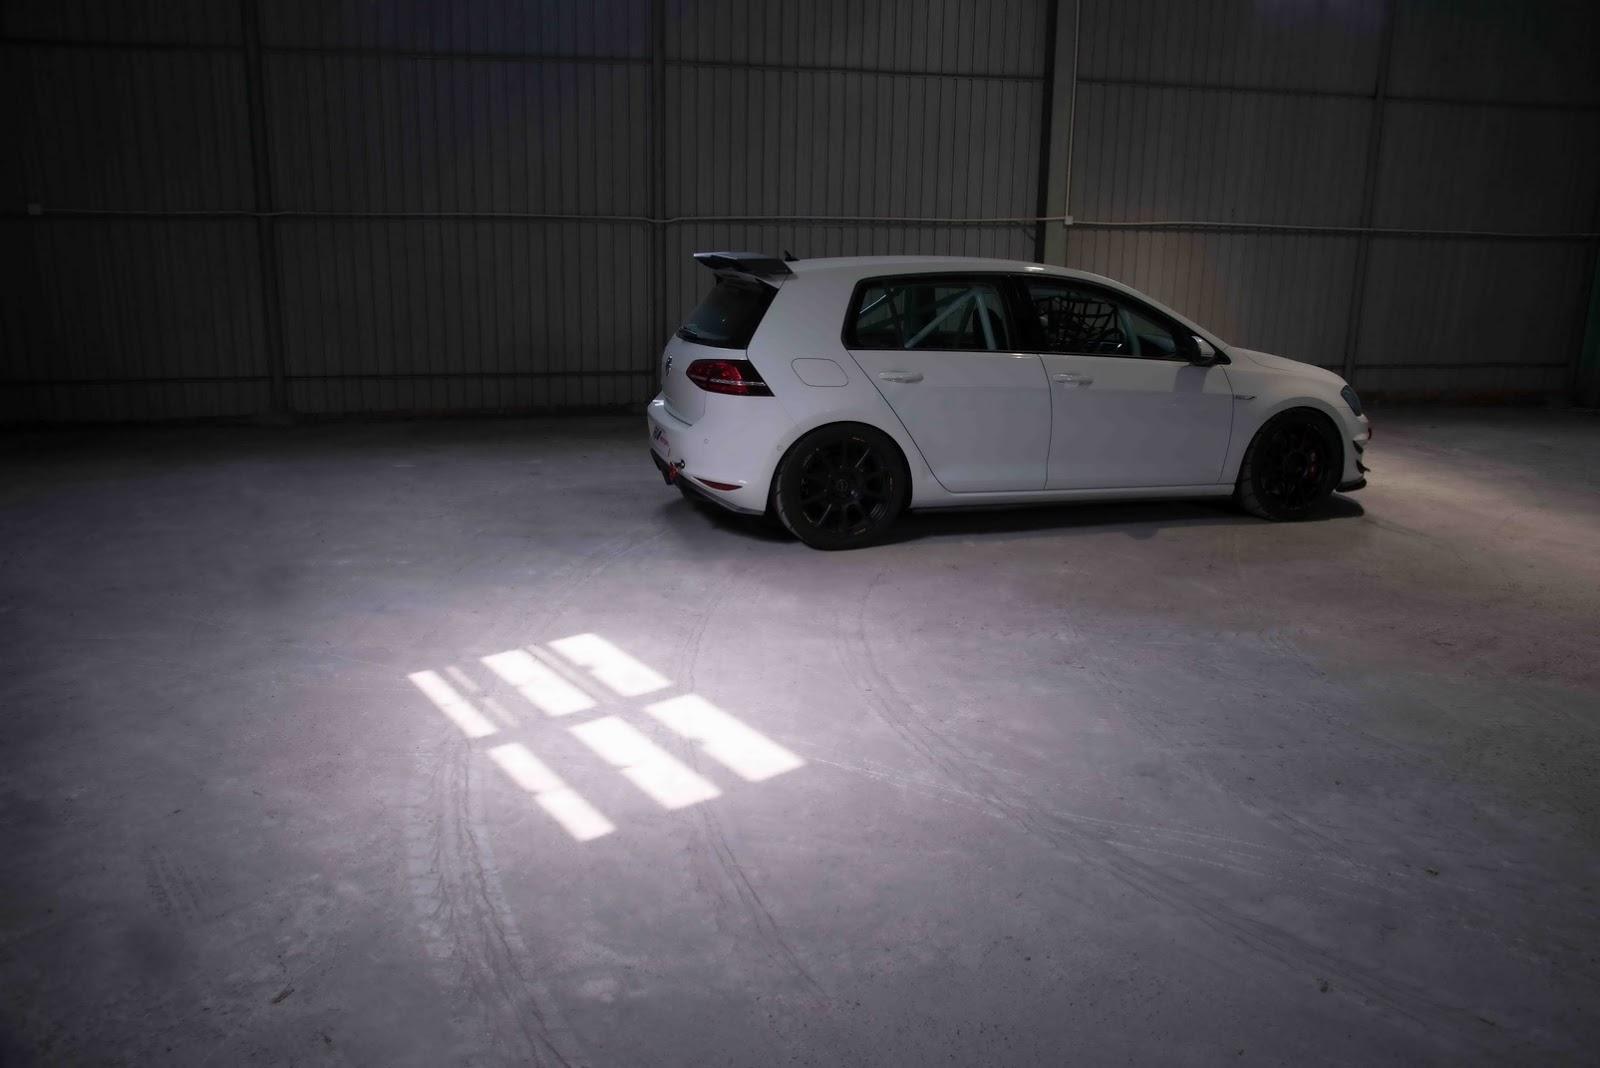 Volkswagen_e-Golf_Razor_7E_by_RevoZport_04